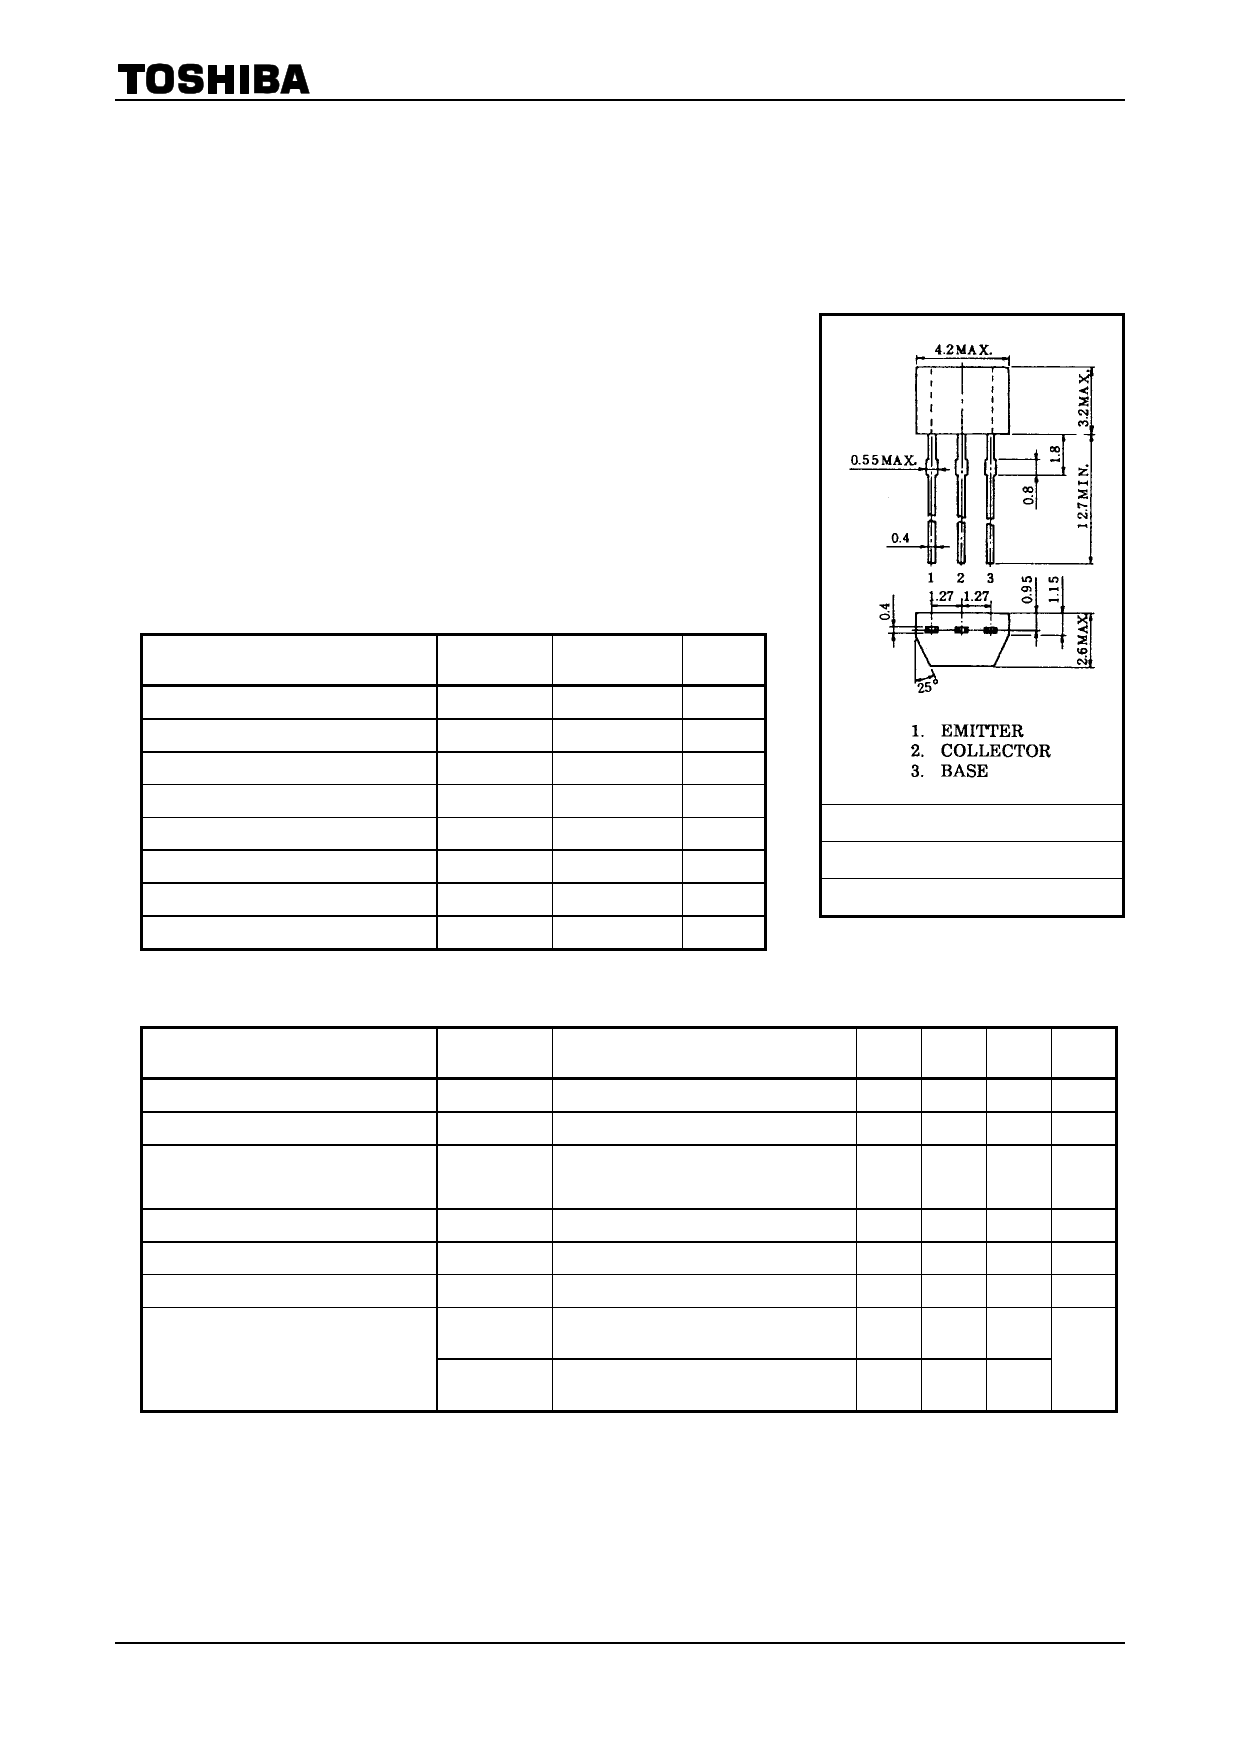 2SC2458 Datasheet, 2SC2458 PDF,ピン配置, 機能